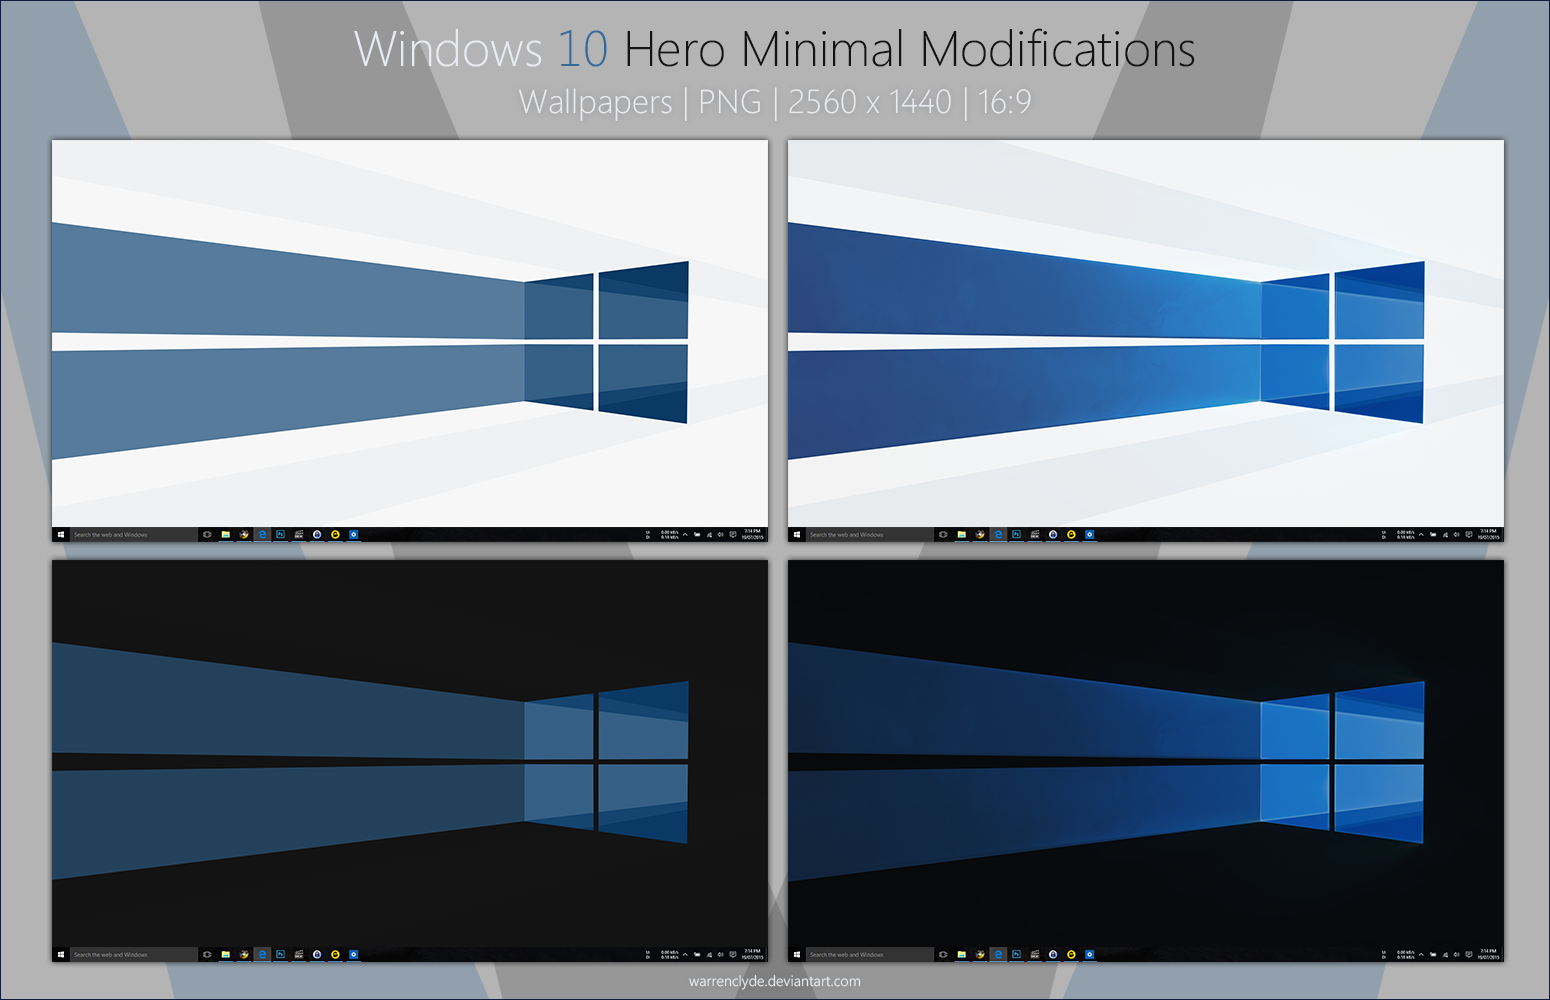 Windows 10 Hero Minimal Wallpapers by WarrenClyde 1550x1000